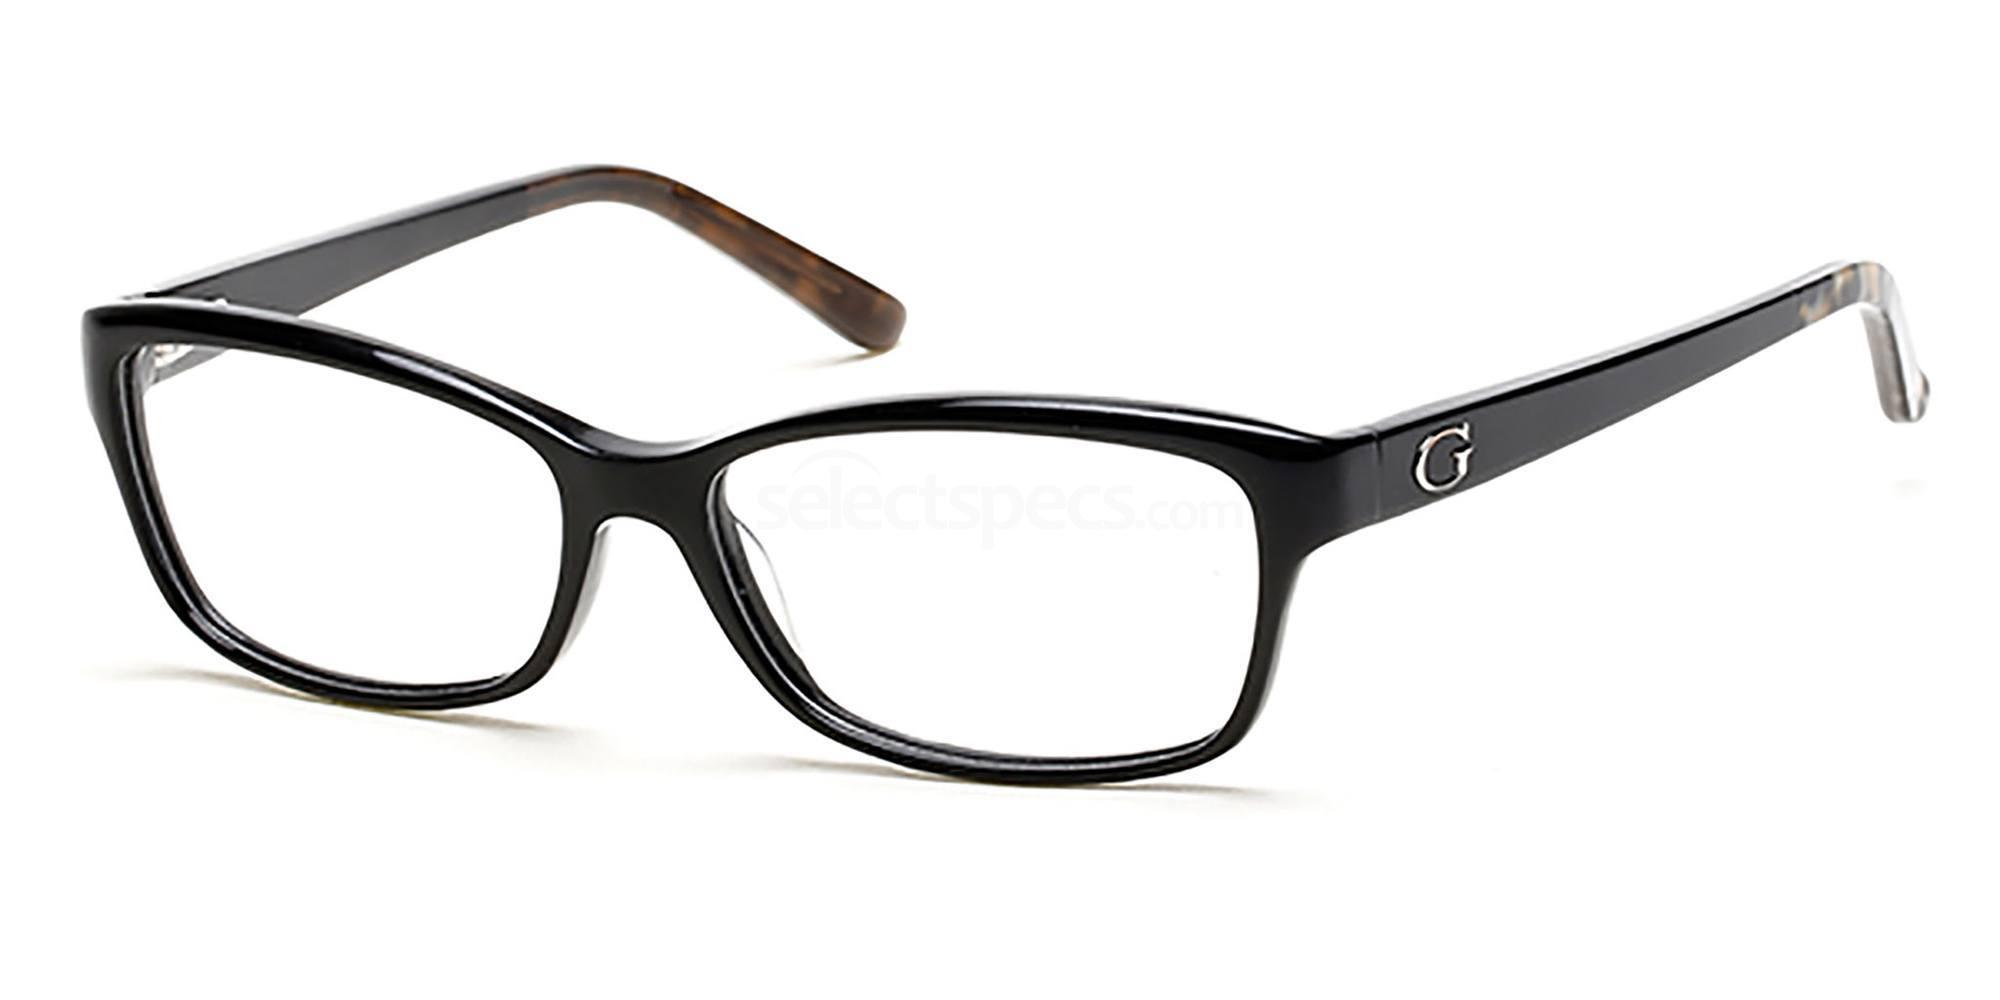 001 GU2542 Glasses, Guess